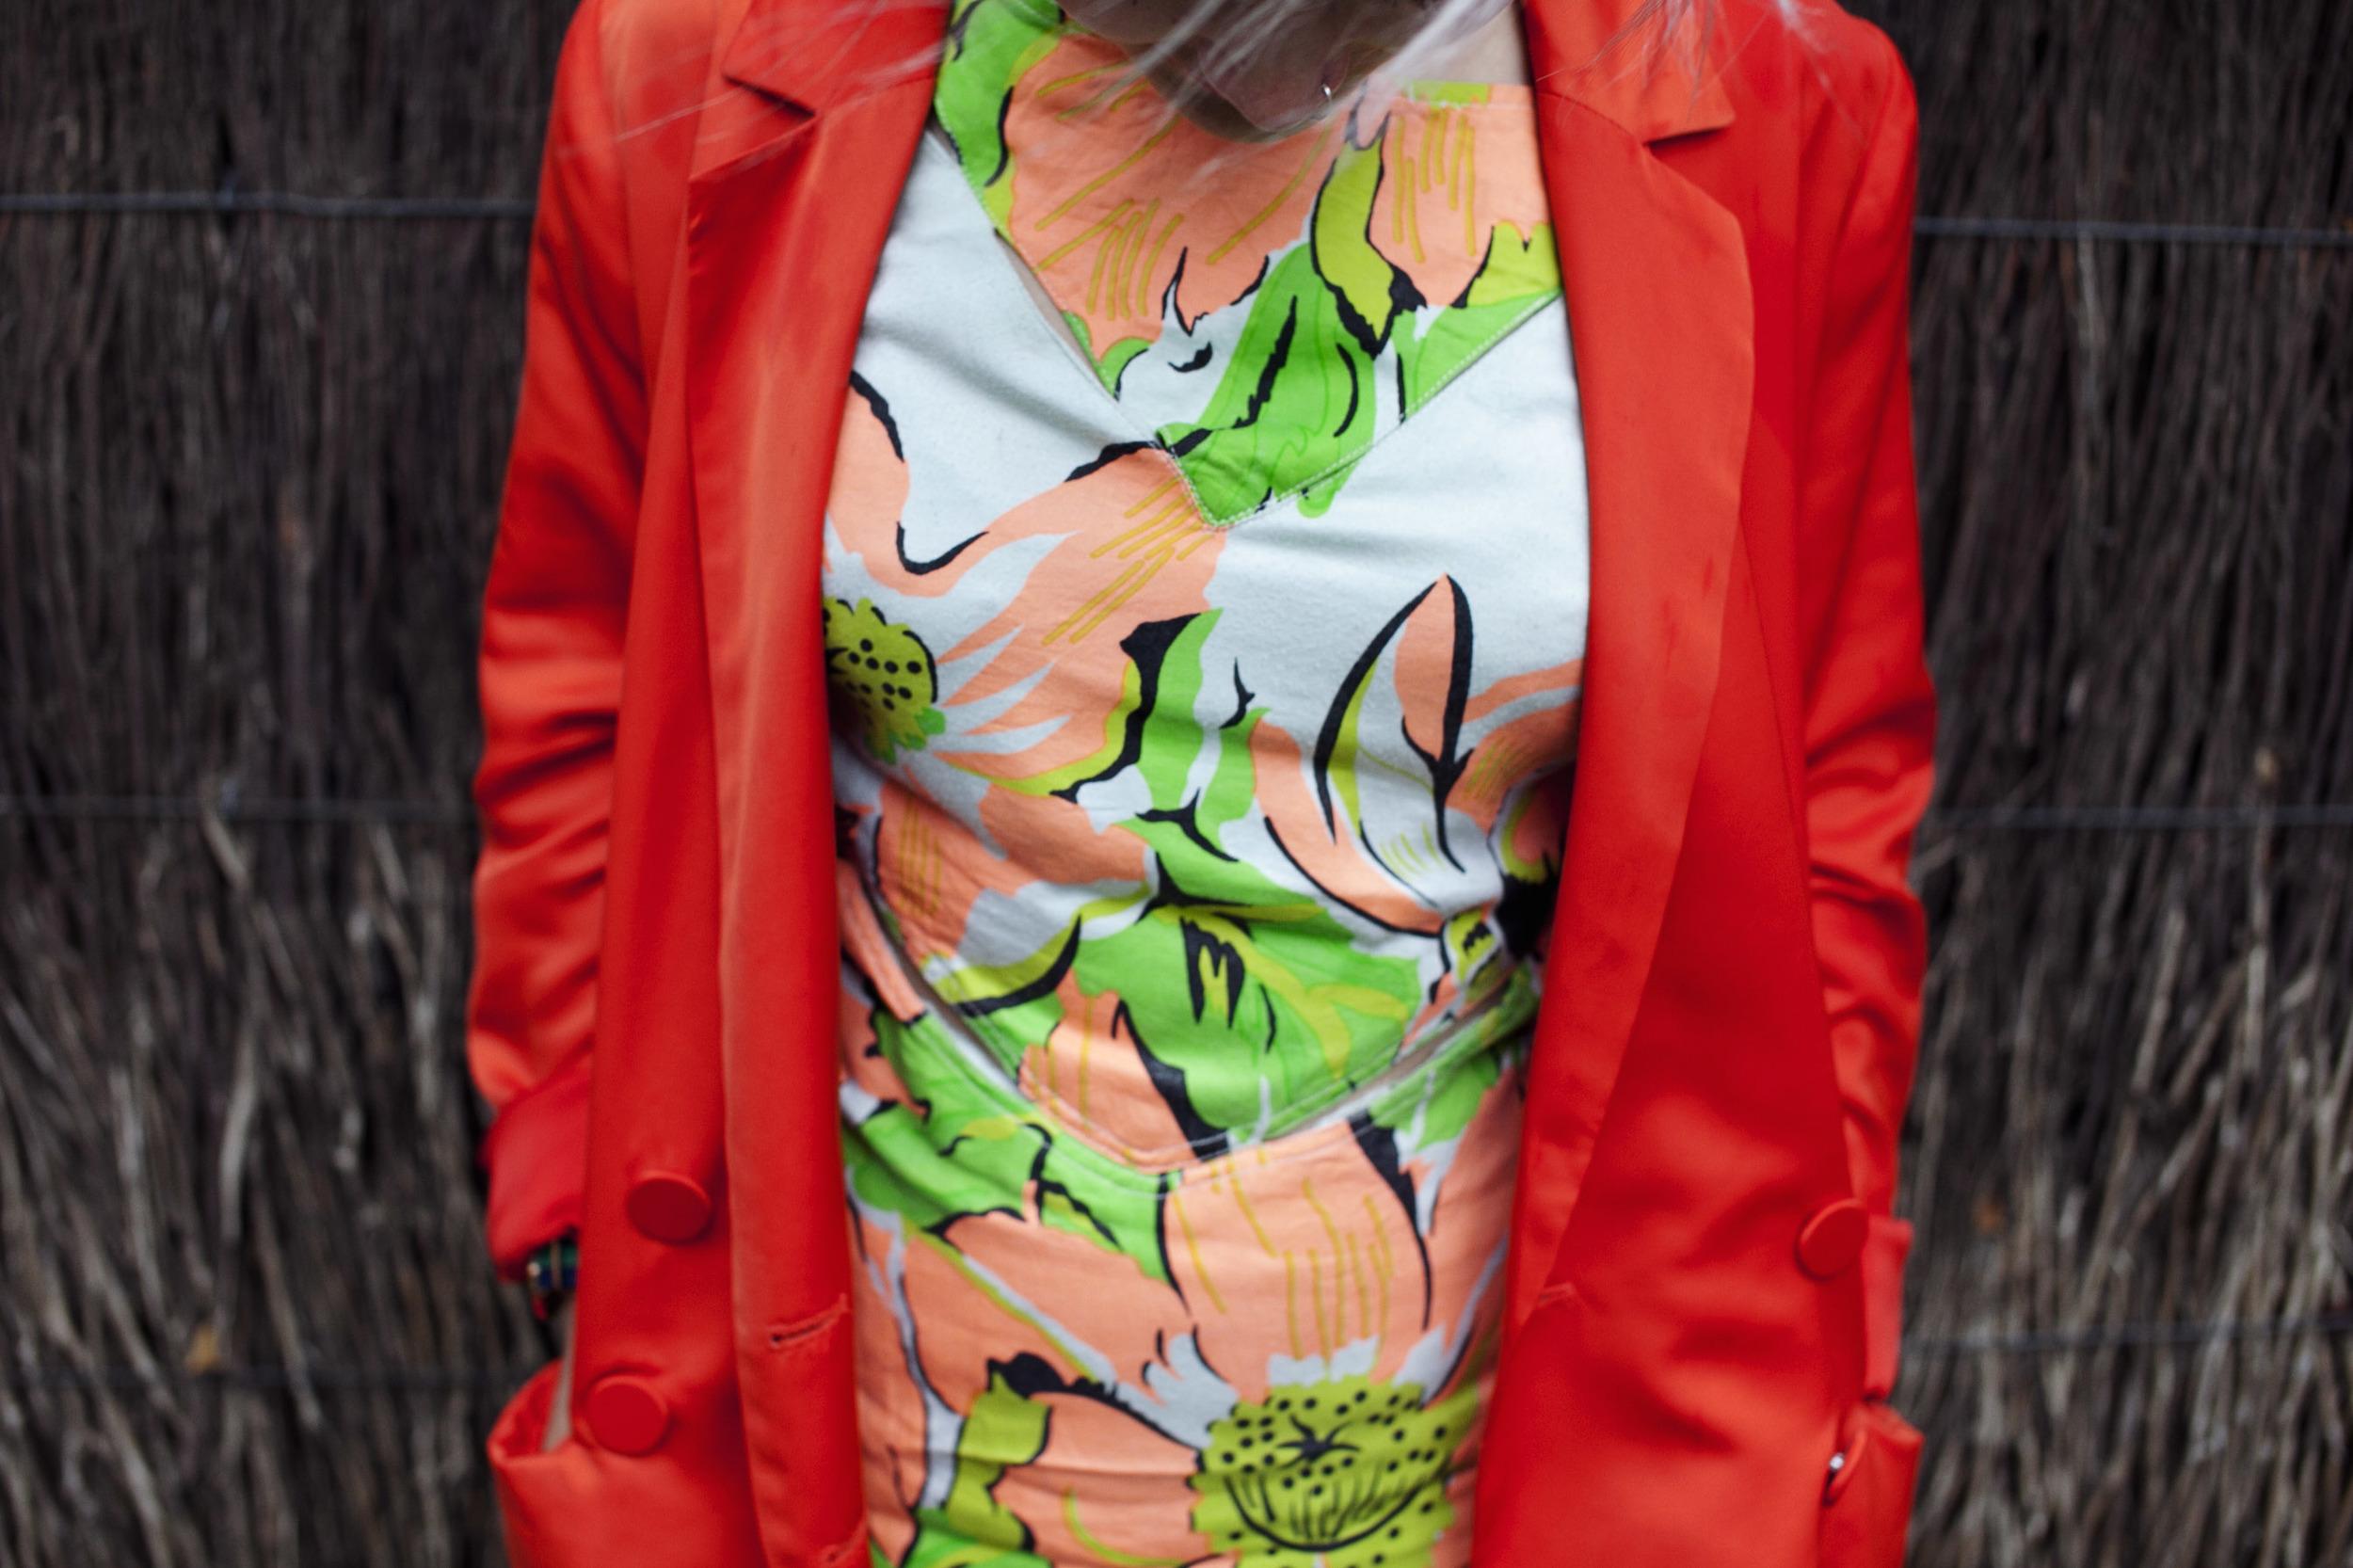 H&M Conscious Collection blazer | State of Georgia banana split dress (gift)